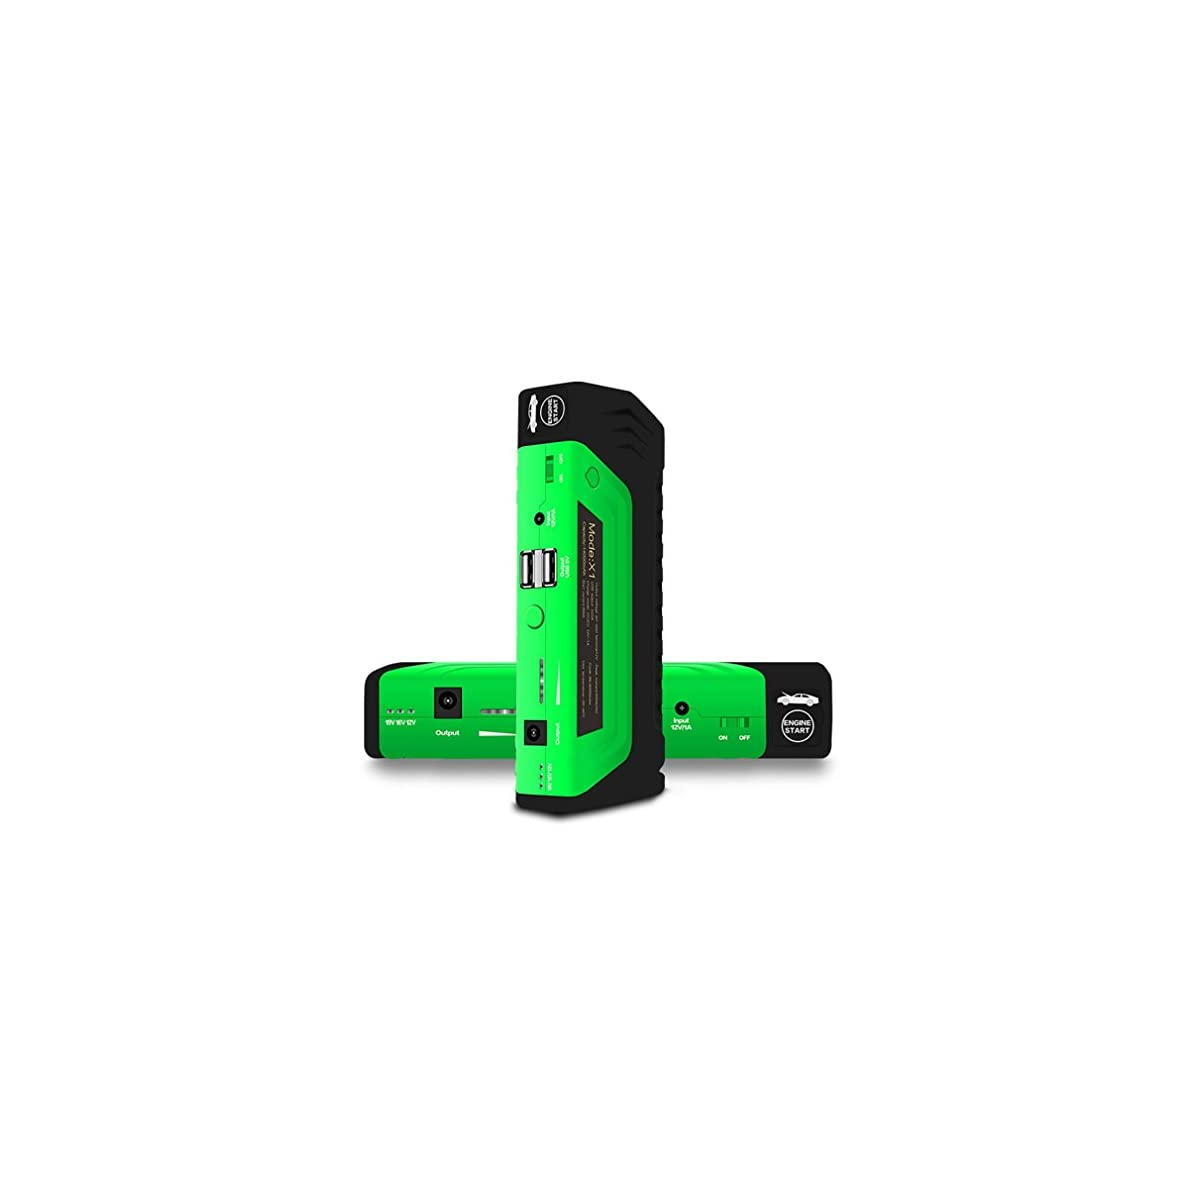 41t%2BjoyA2QL. SS1200  - WJJ- Portable Car Jump Starter 16800mAh 12 Voltios 600A Peak Ampere Camión Batería Saltar Starter Pack Hasta 6.0L de gas del vehículo, 4.0L Diesel Car Battery Booster